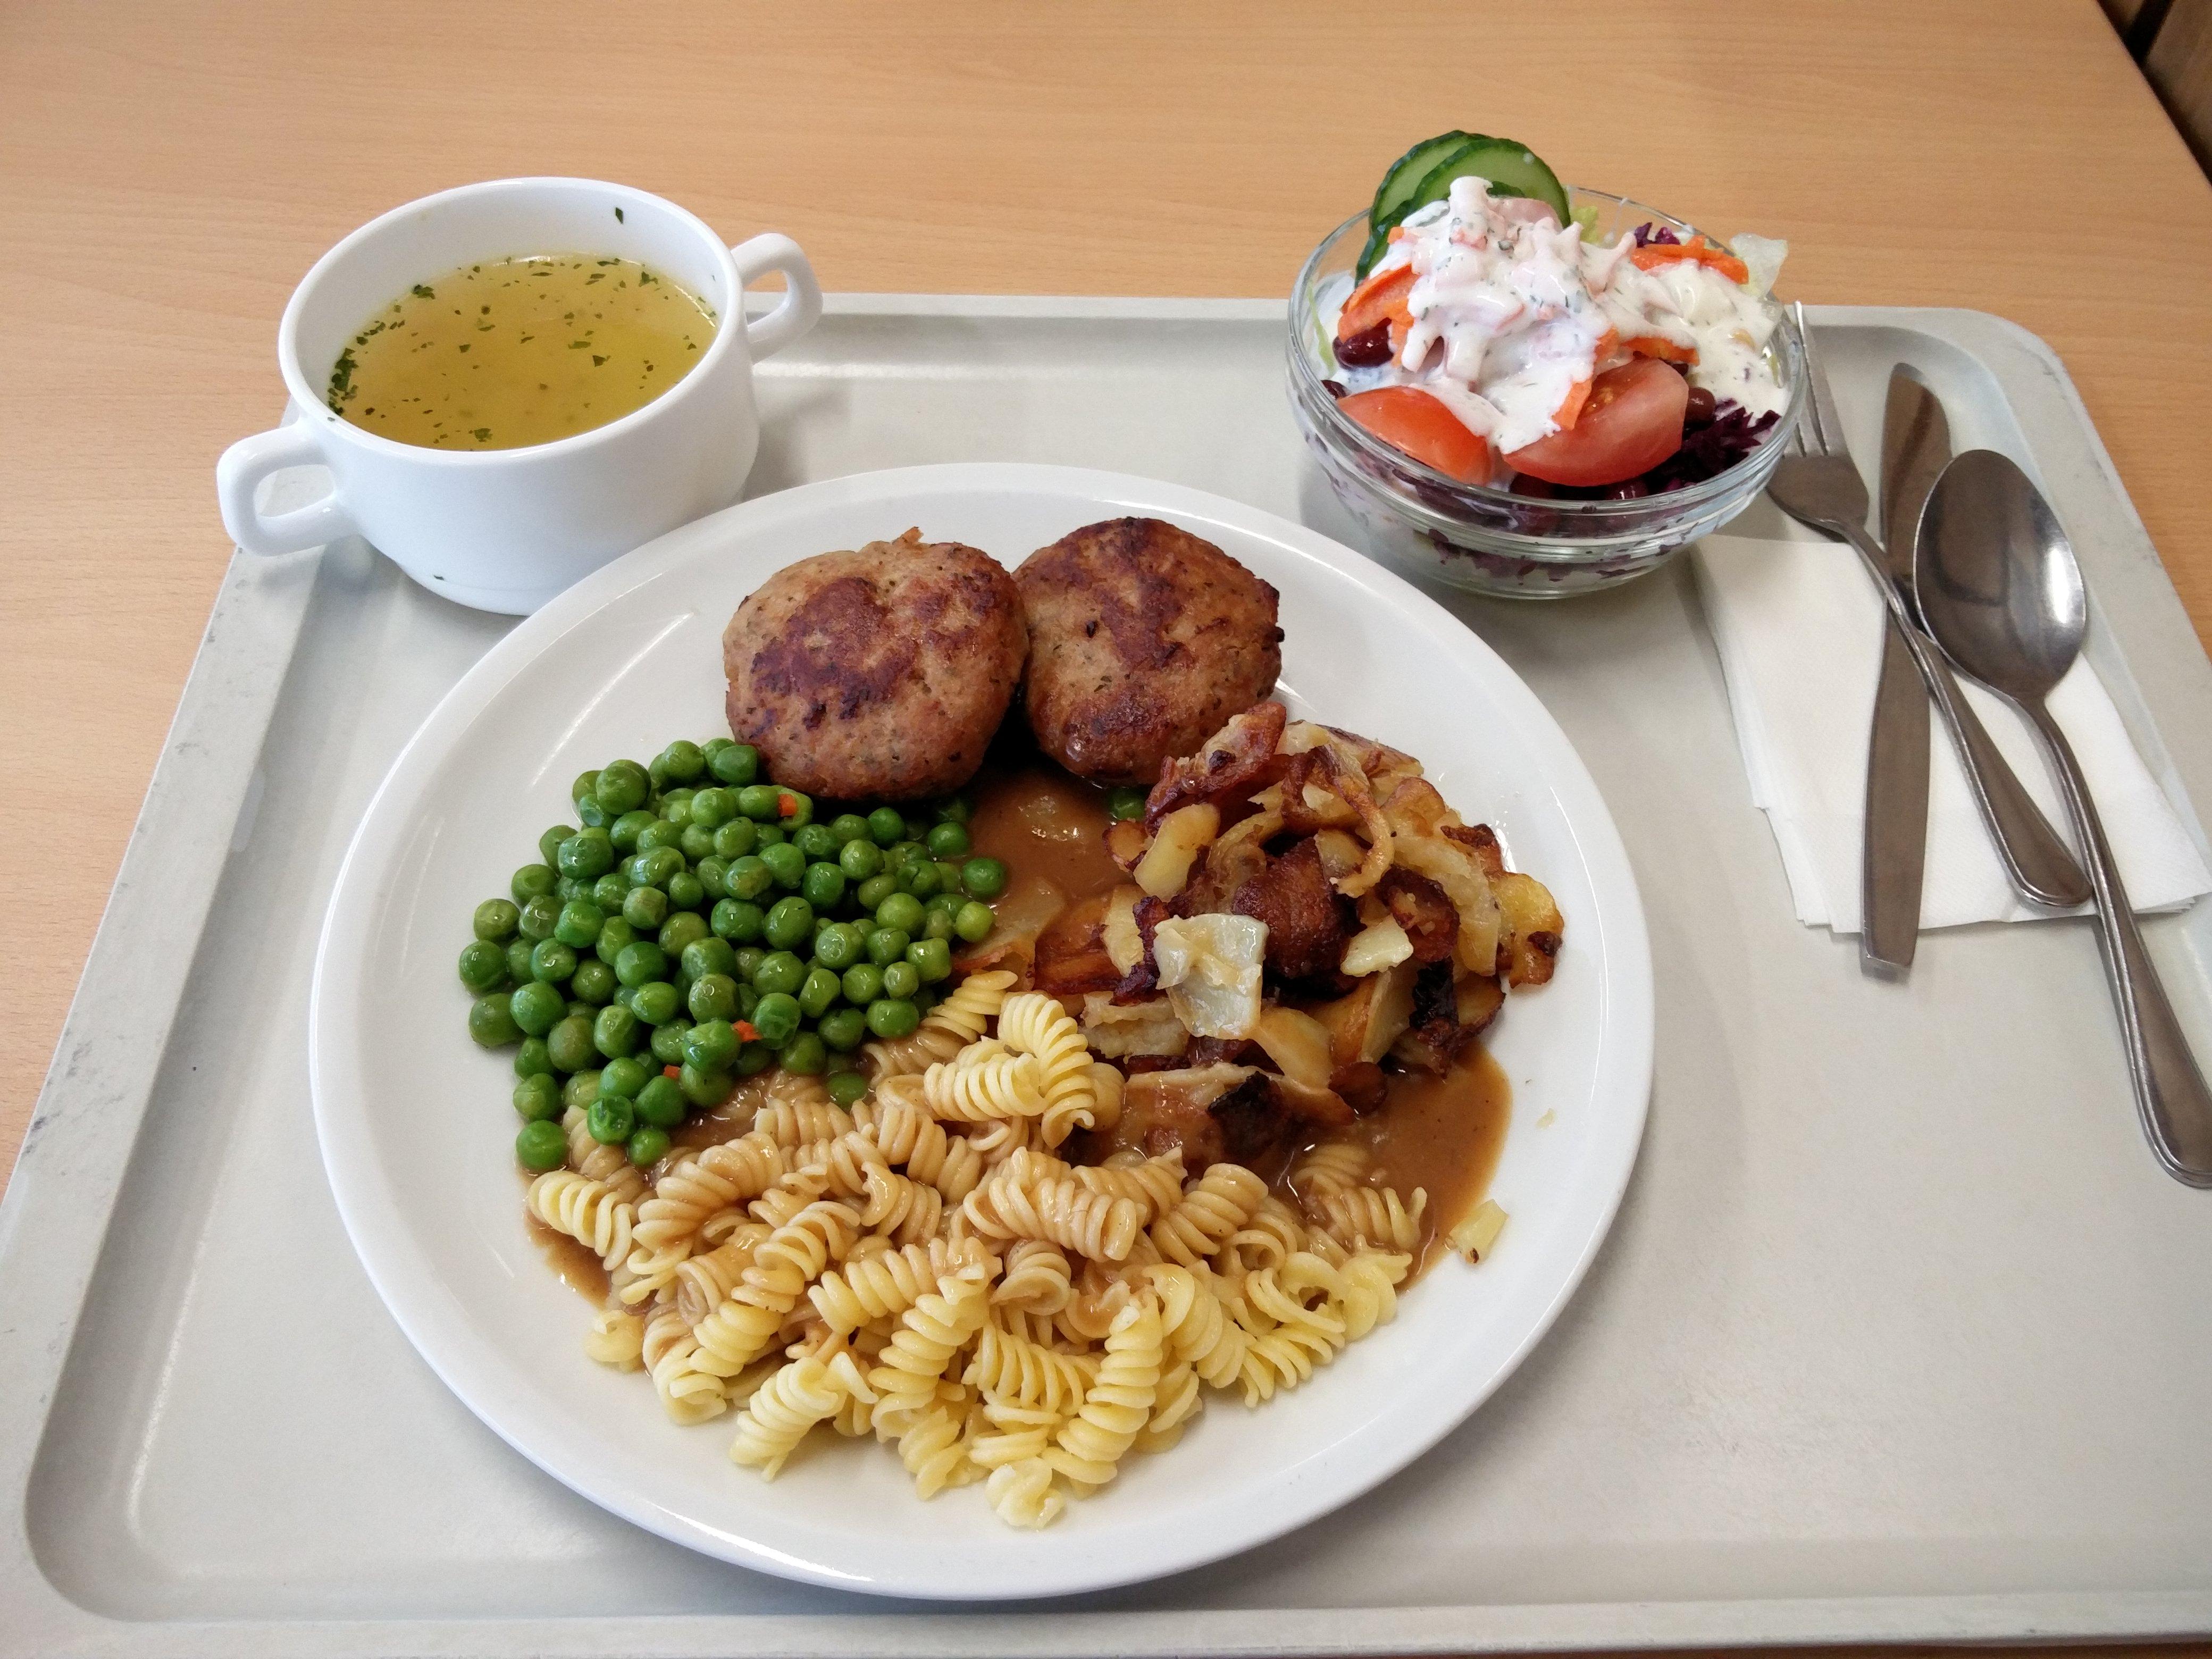 https://foodloader.net/nico_2016-06-10_fleischkuechle-nudeln-bratkartoffeln-suppe-salat.jpg